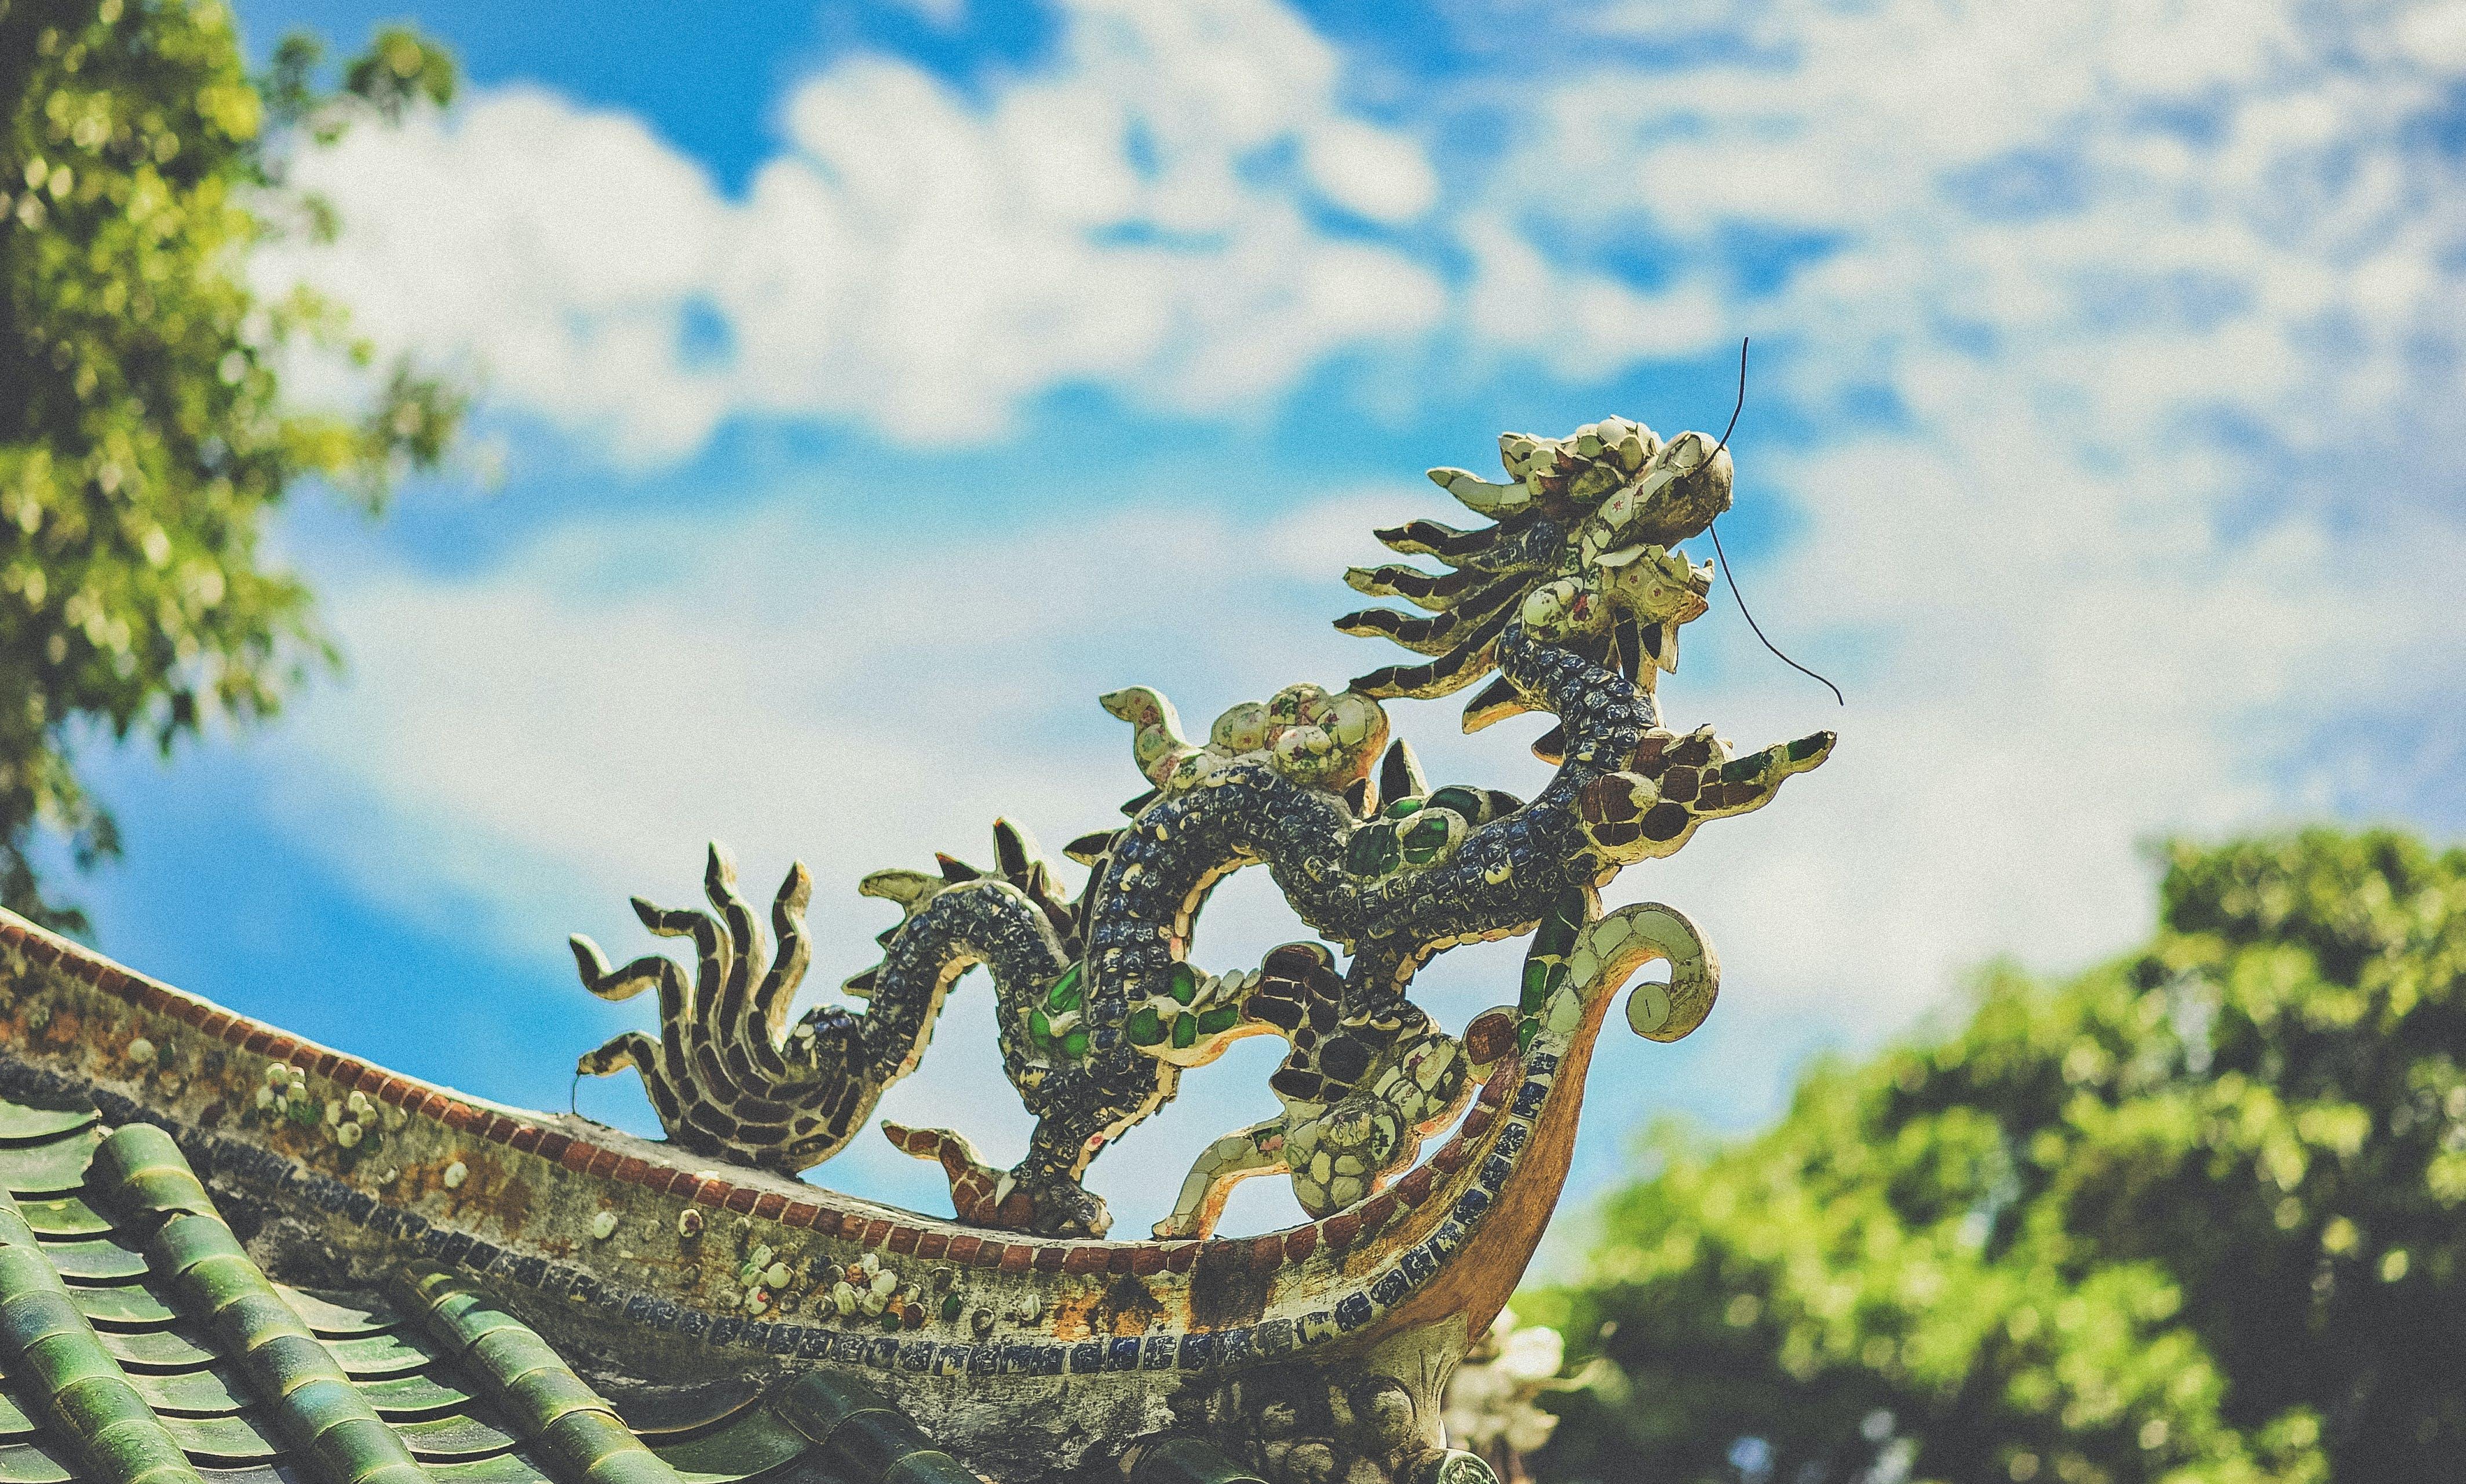 Black Dragon Roof Ornament